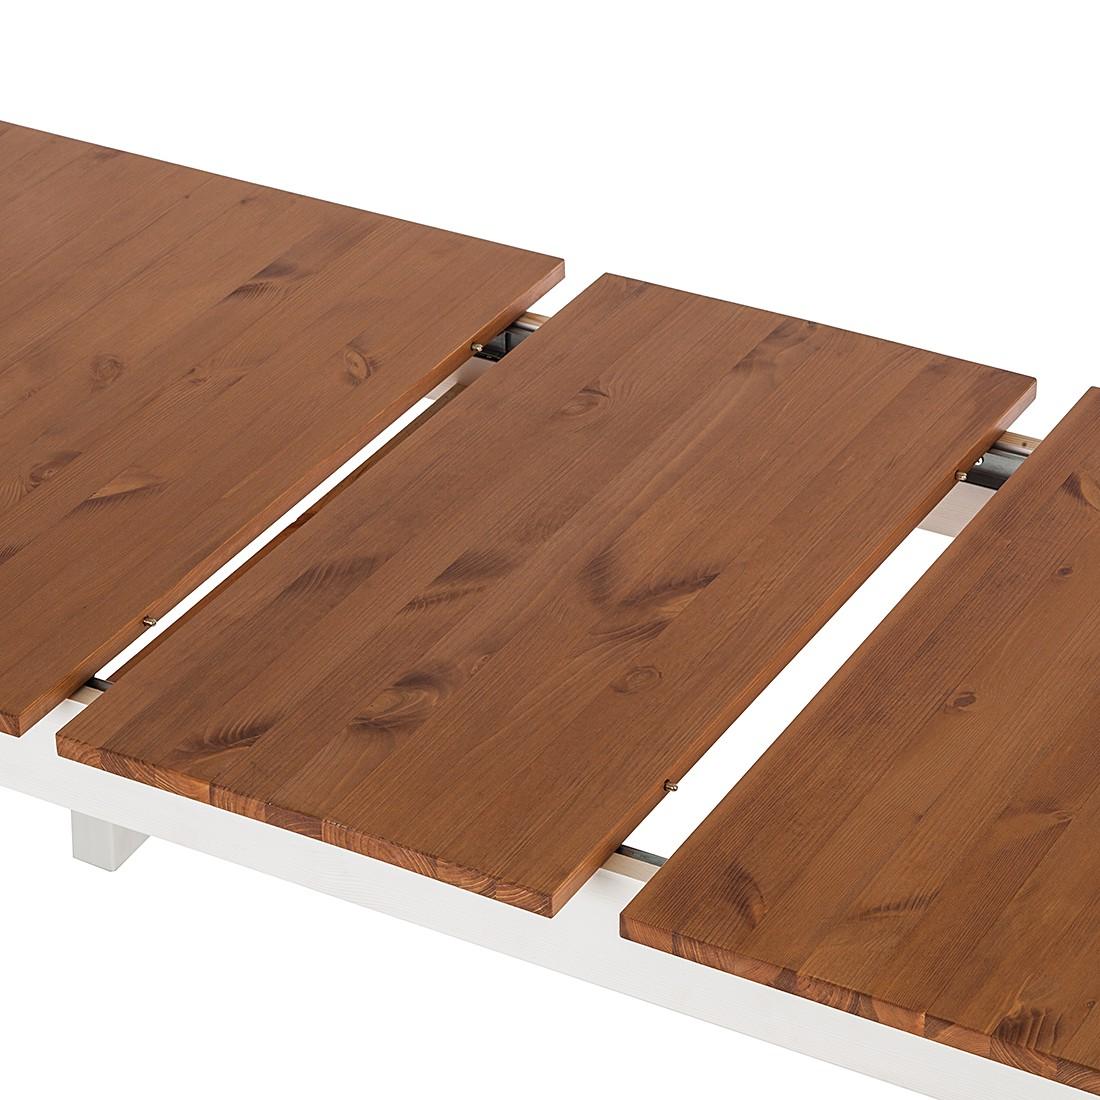 Tischplatte 120x80 Tischplatte Holz Baumarkt 559057 Tischplatte